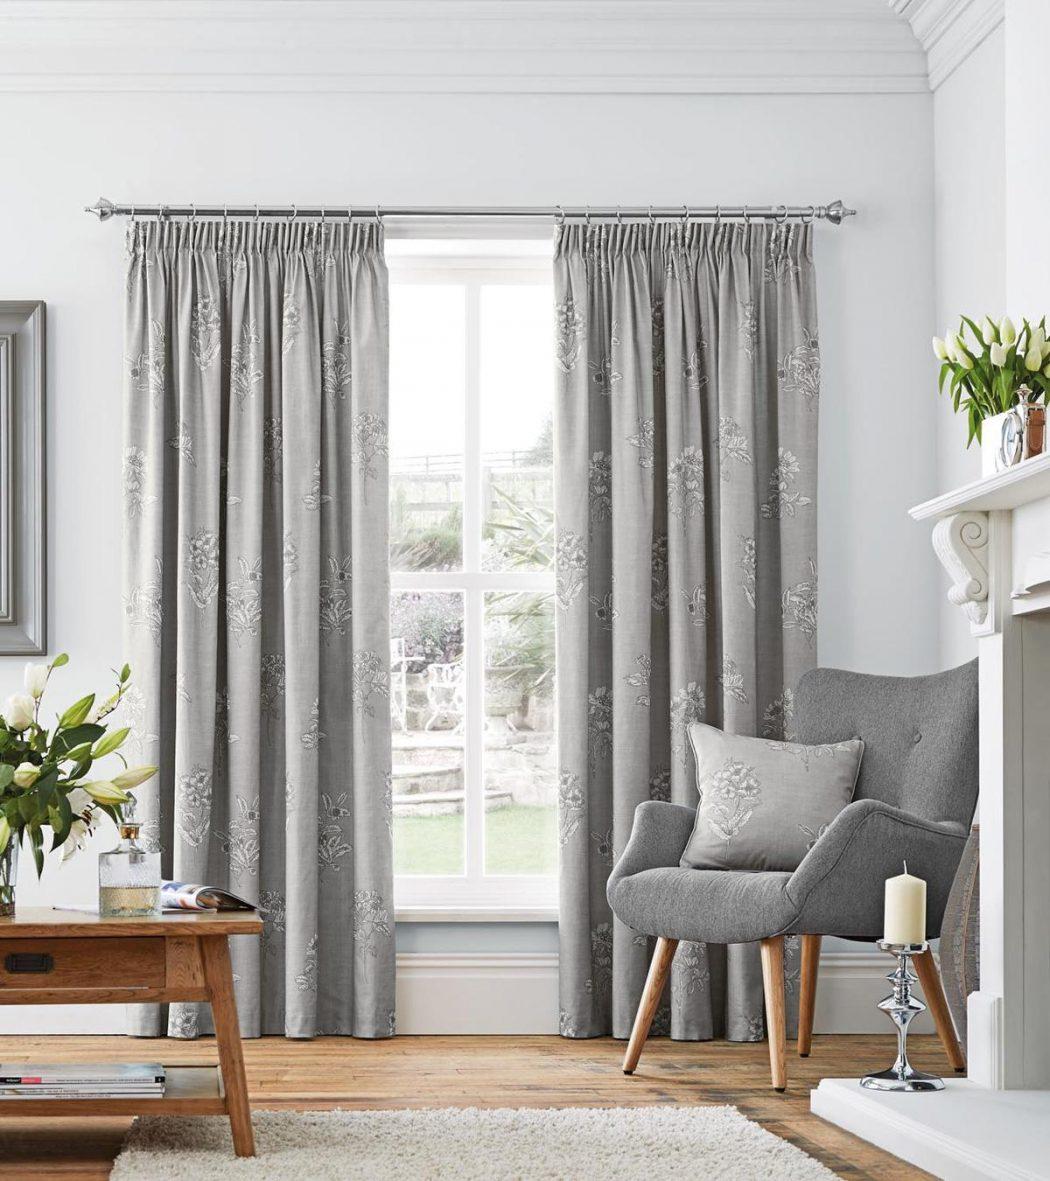 flora-dove-grey 20+ Hottest Curtain Design Ideas for 2020